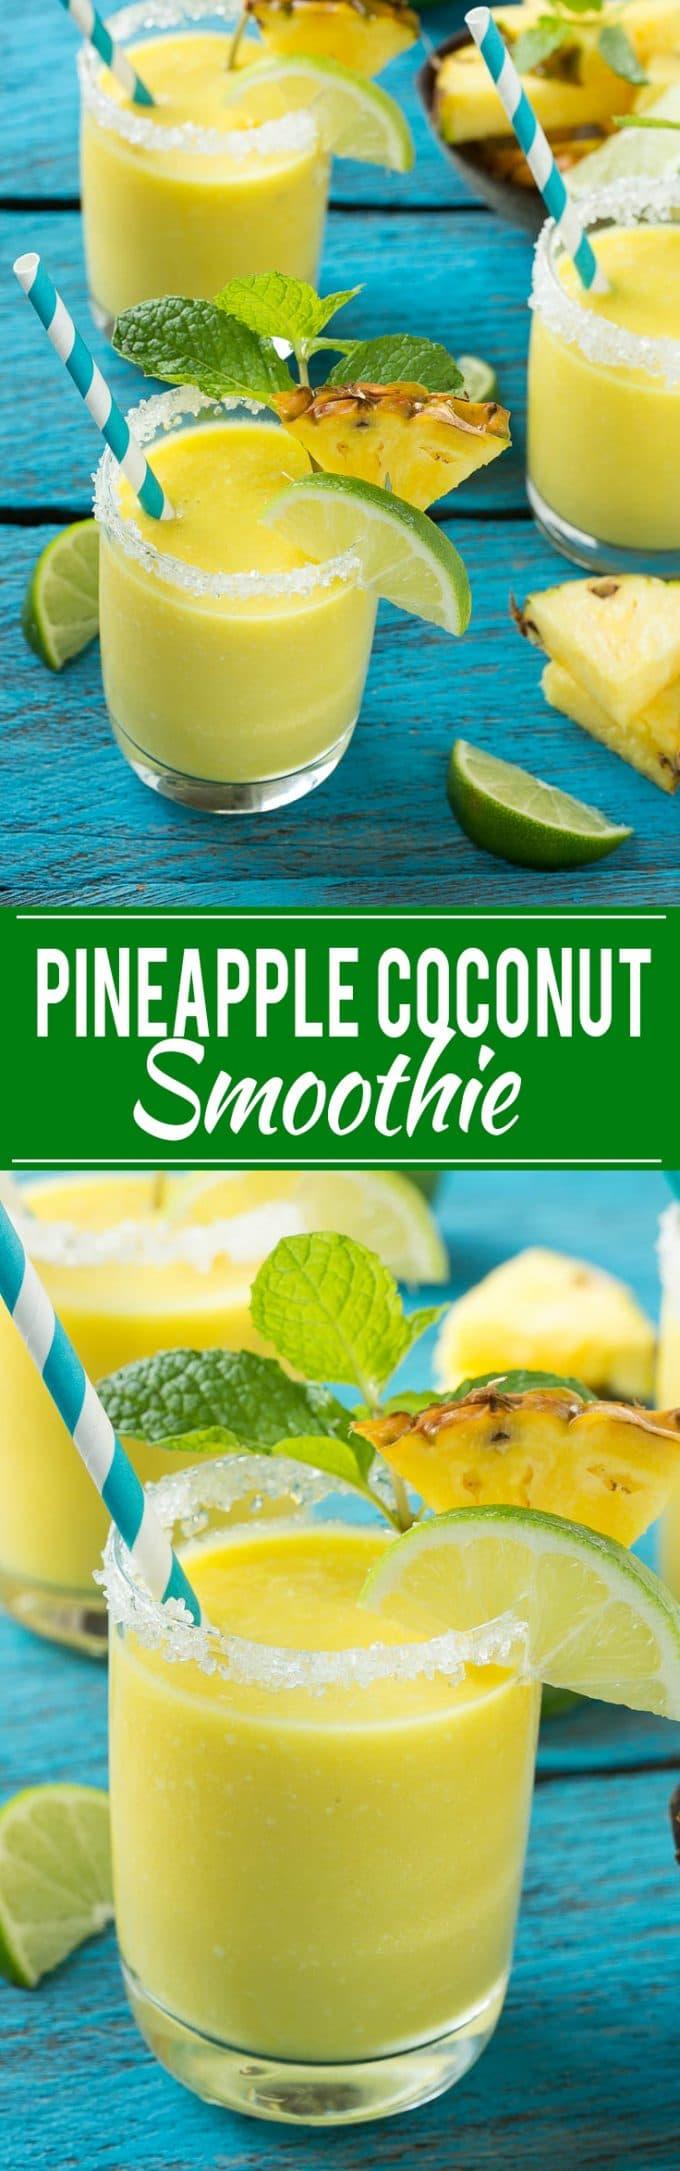 Pineapple Coconut Smoothie Recipe | Pineapple Coconut Smoothie | Tropical Smoothie | Easy Tropical Smoothie | Best Tropical Smoothie | Pina Colada Smoothie | Best Pina Colada Smoothie | Easy Pina Colada Smoothie